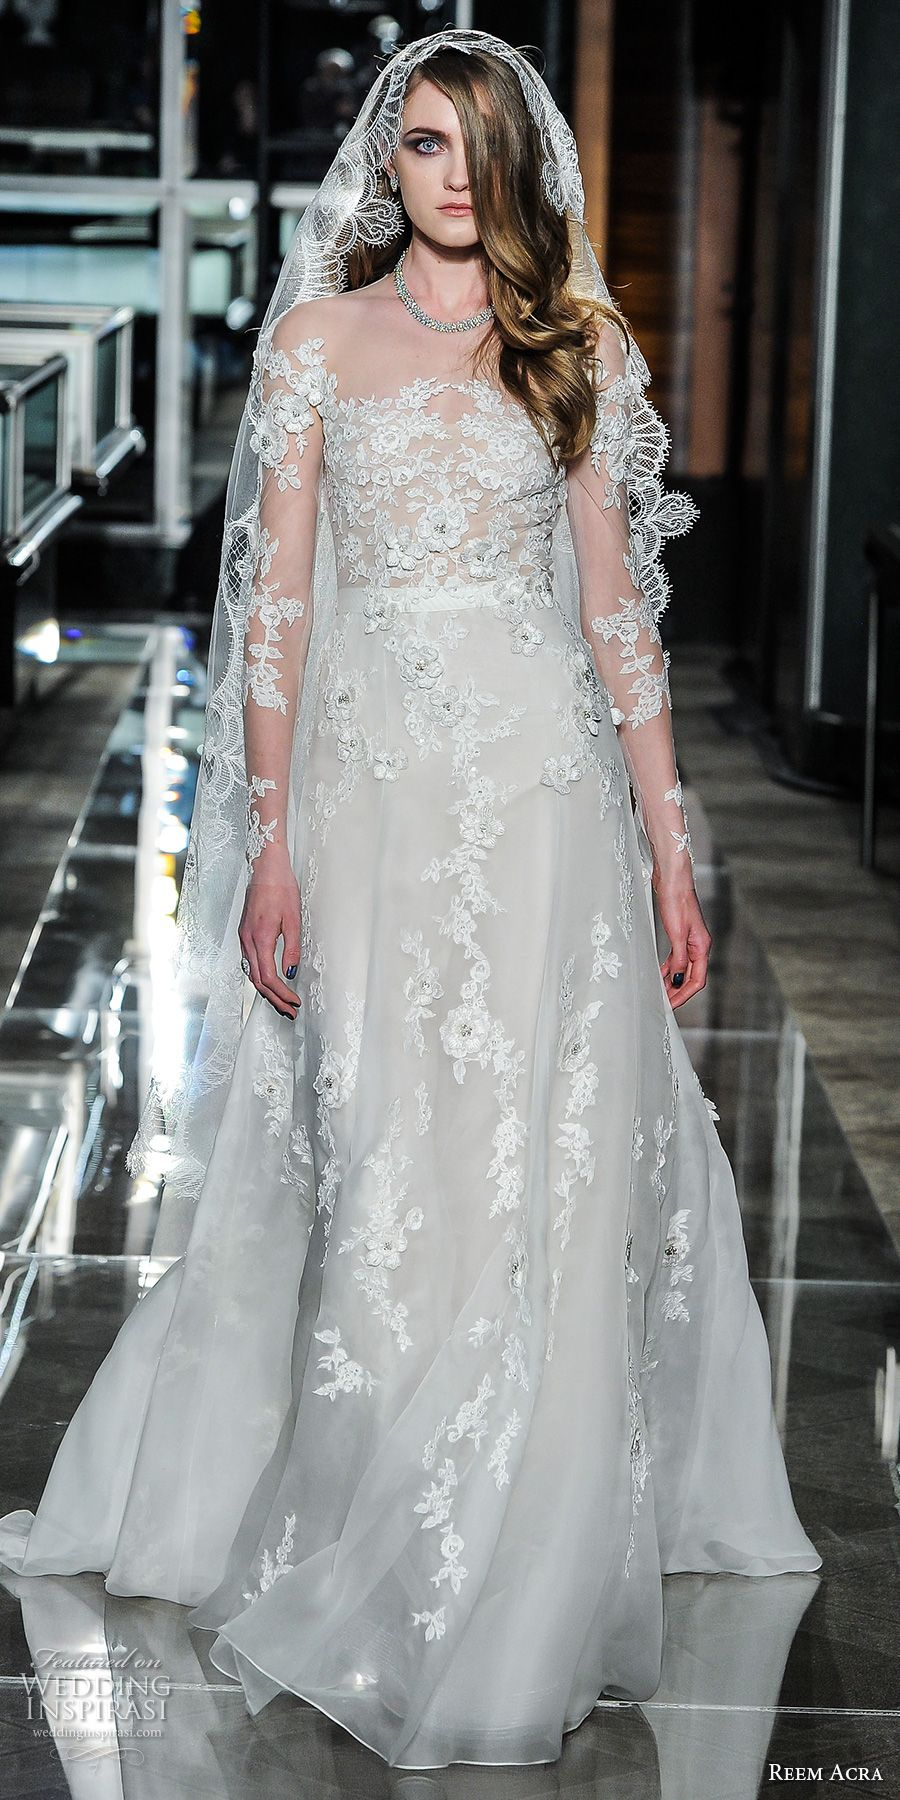 Reem Acra Spring 2018 Wedding Dresses New York Bridal Fashion Week Runway Show Wedding Inspirasi Wedding Dresses Wedding Dress Sizes Romantic Wedding Dress Lace